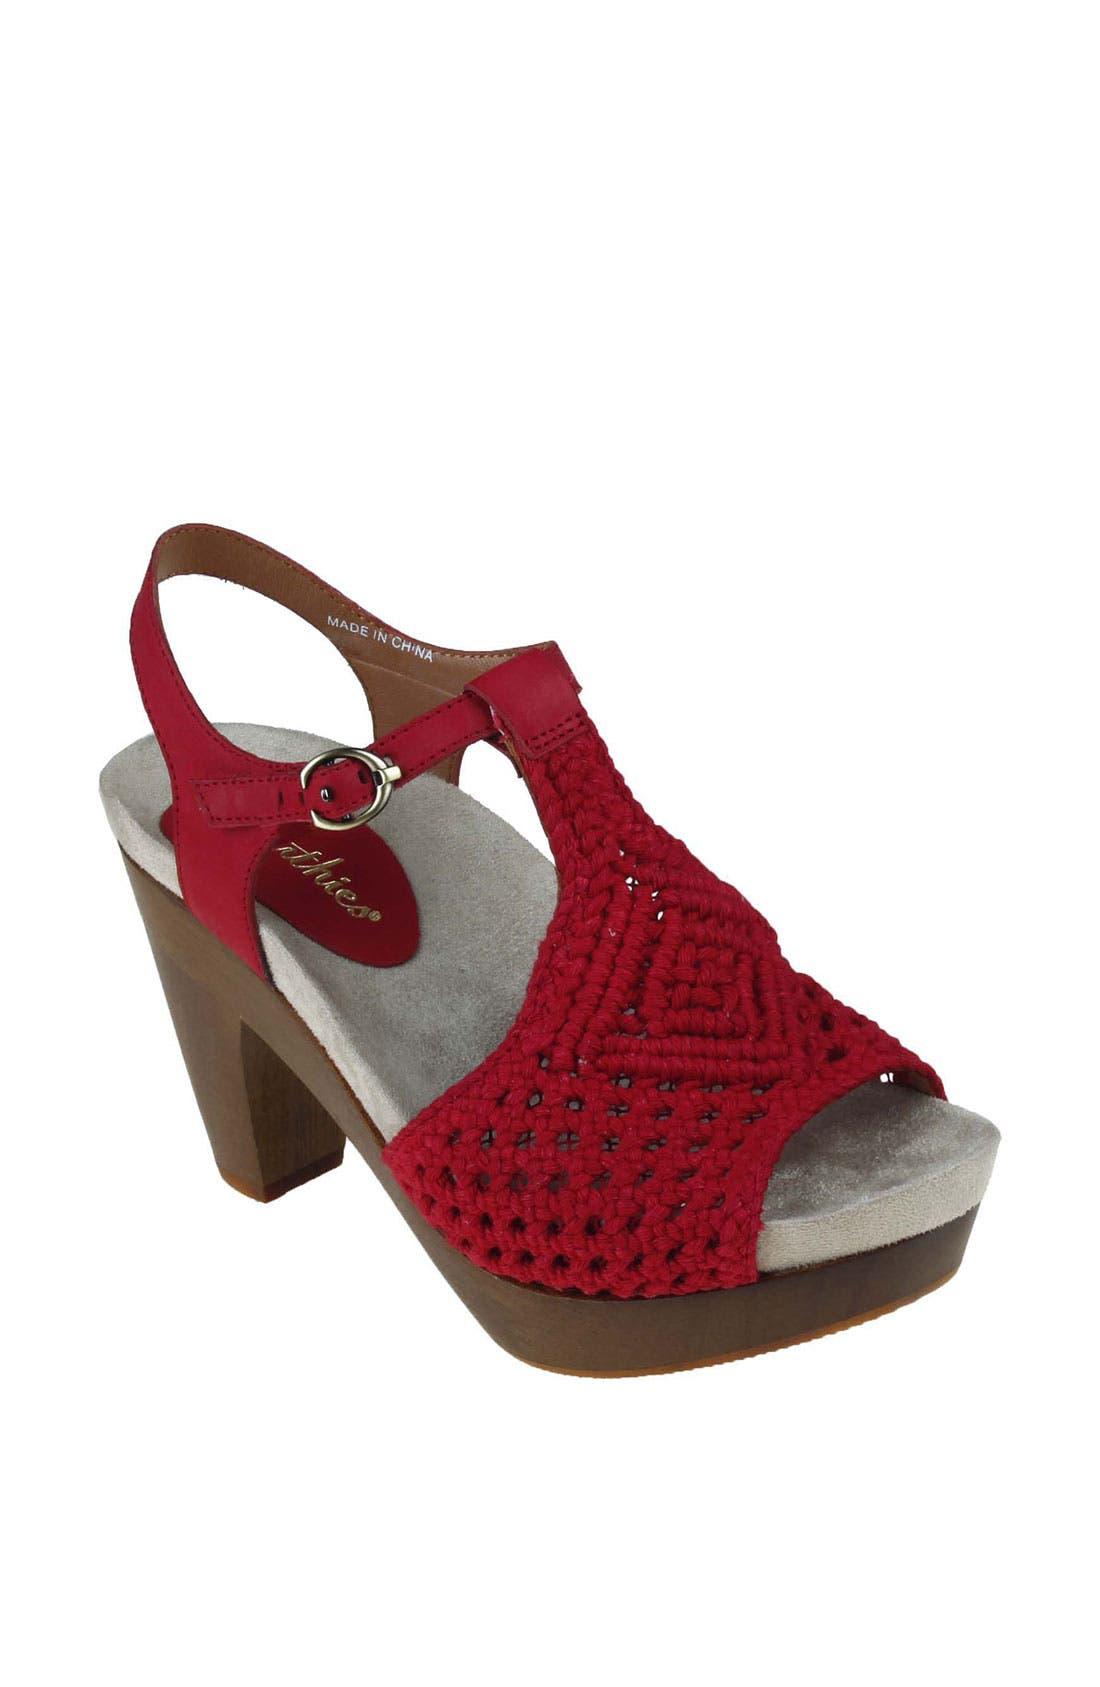 Alternate Image 1 Selected - Earthies® 'Amalfi' Sandal